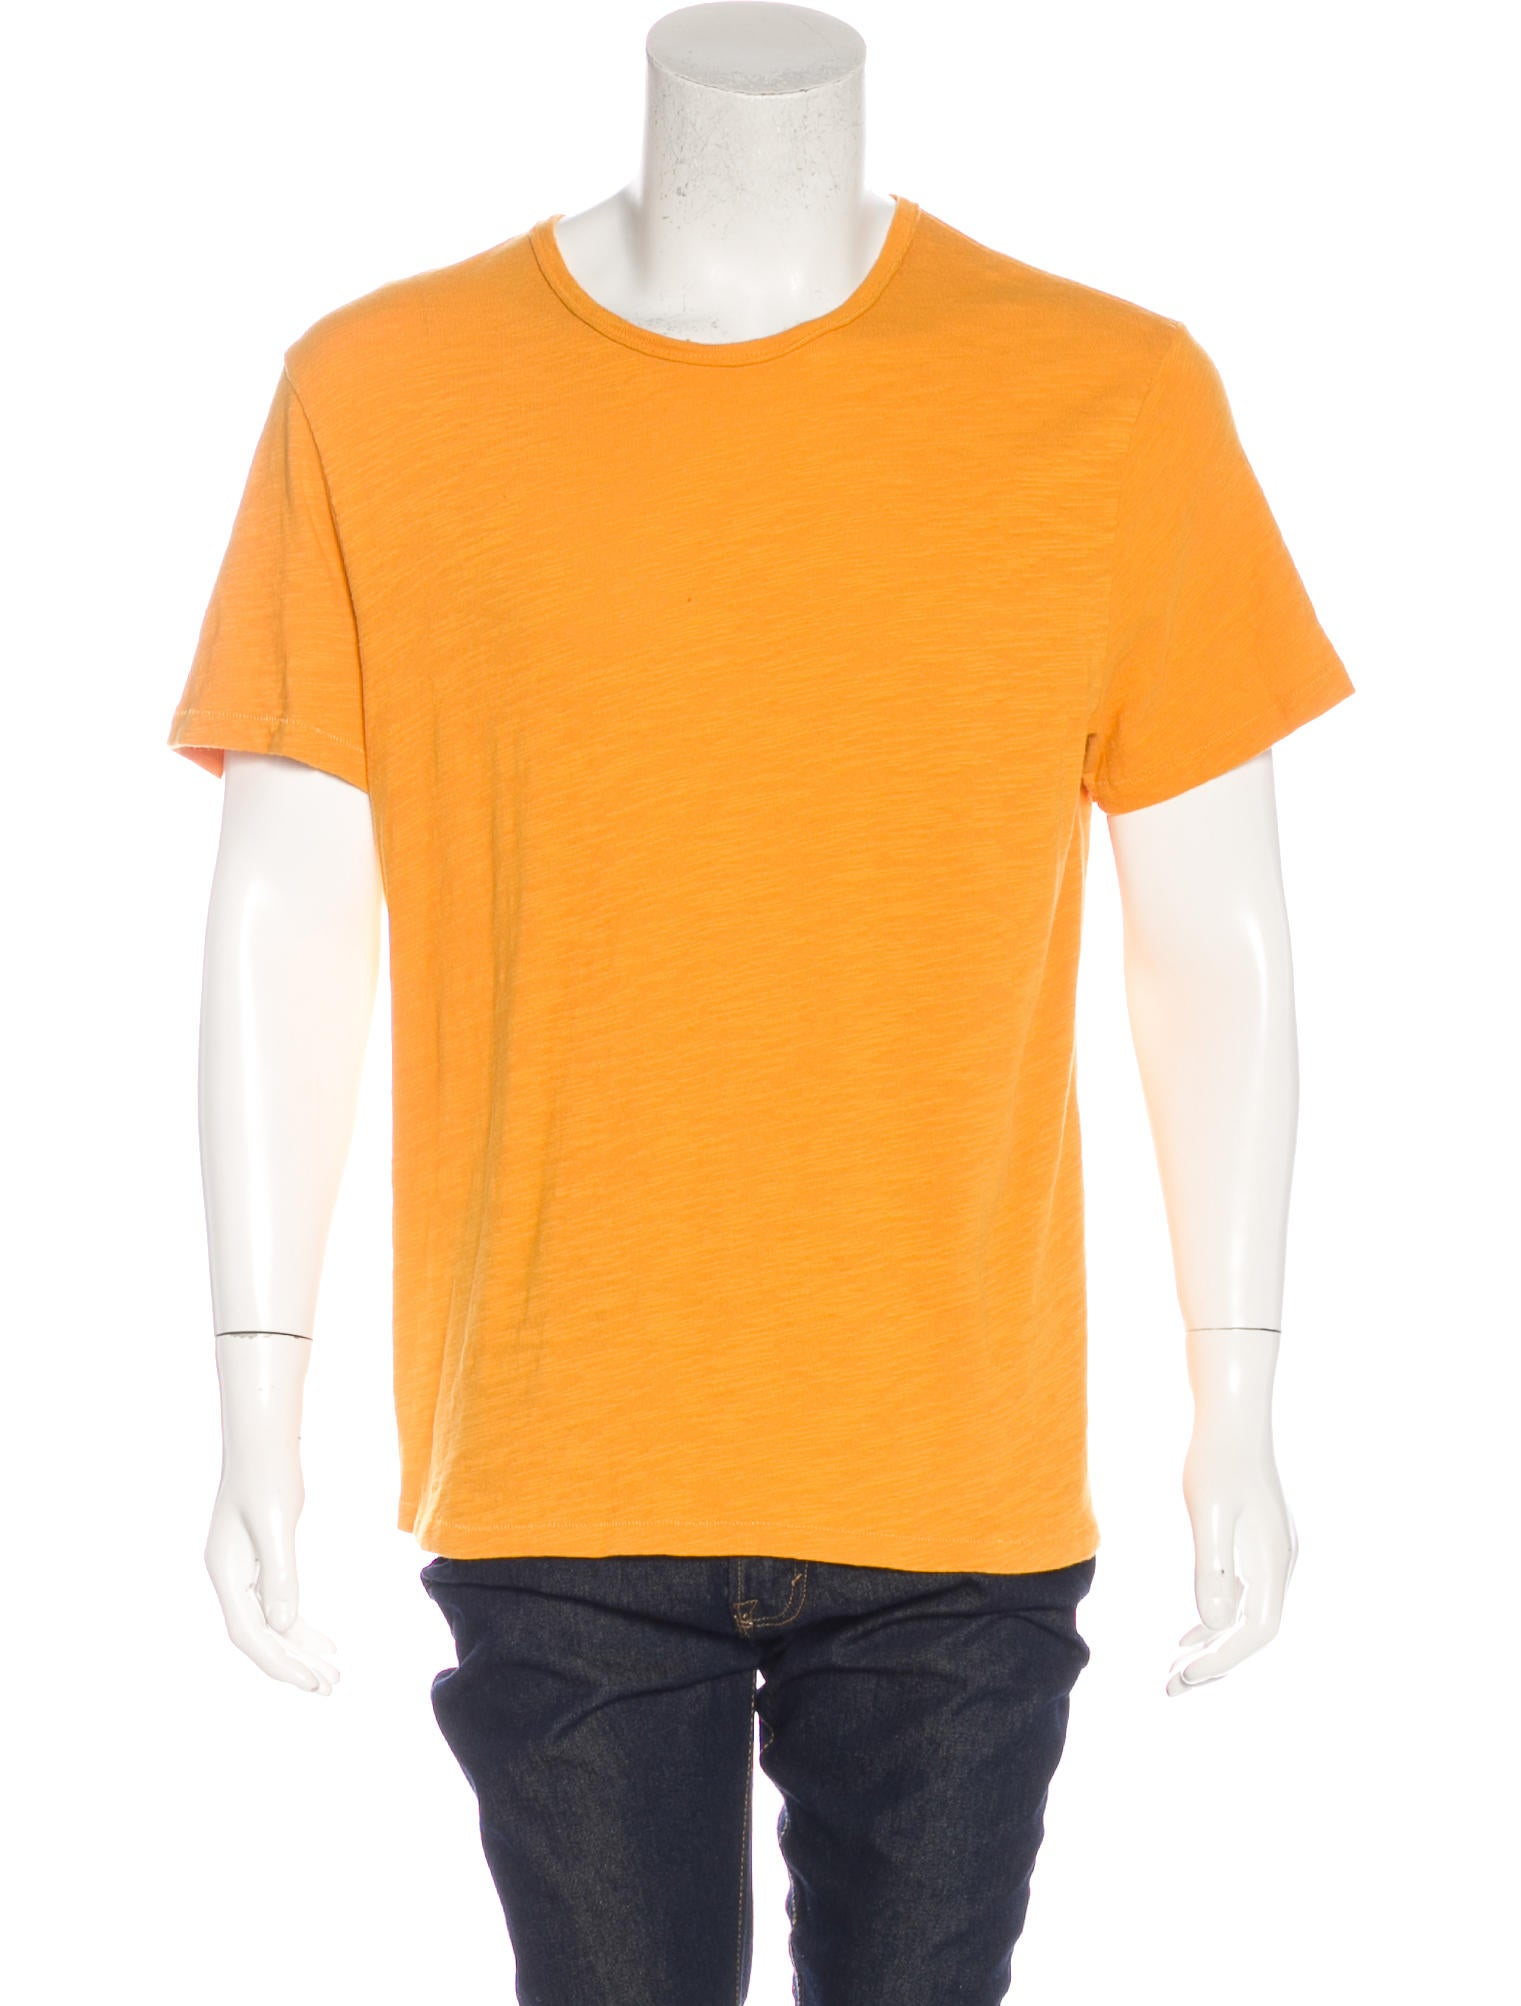 Rag bone crew neck t shirt clothing wragb71801 the for Rag and bone mens shirts sale